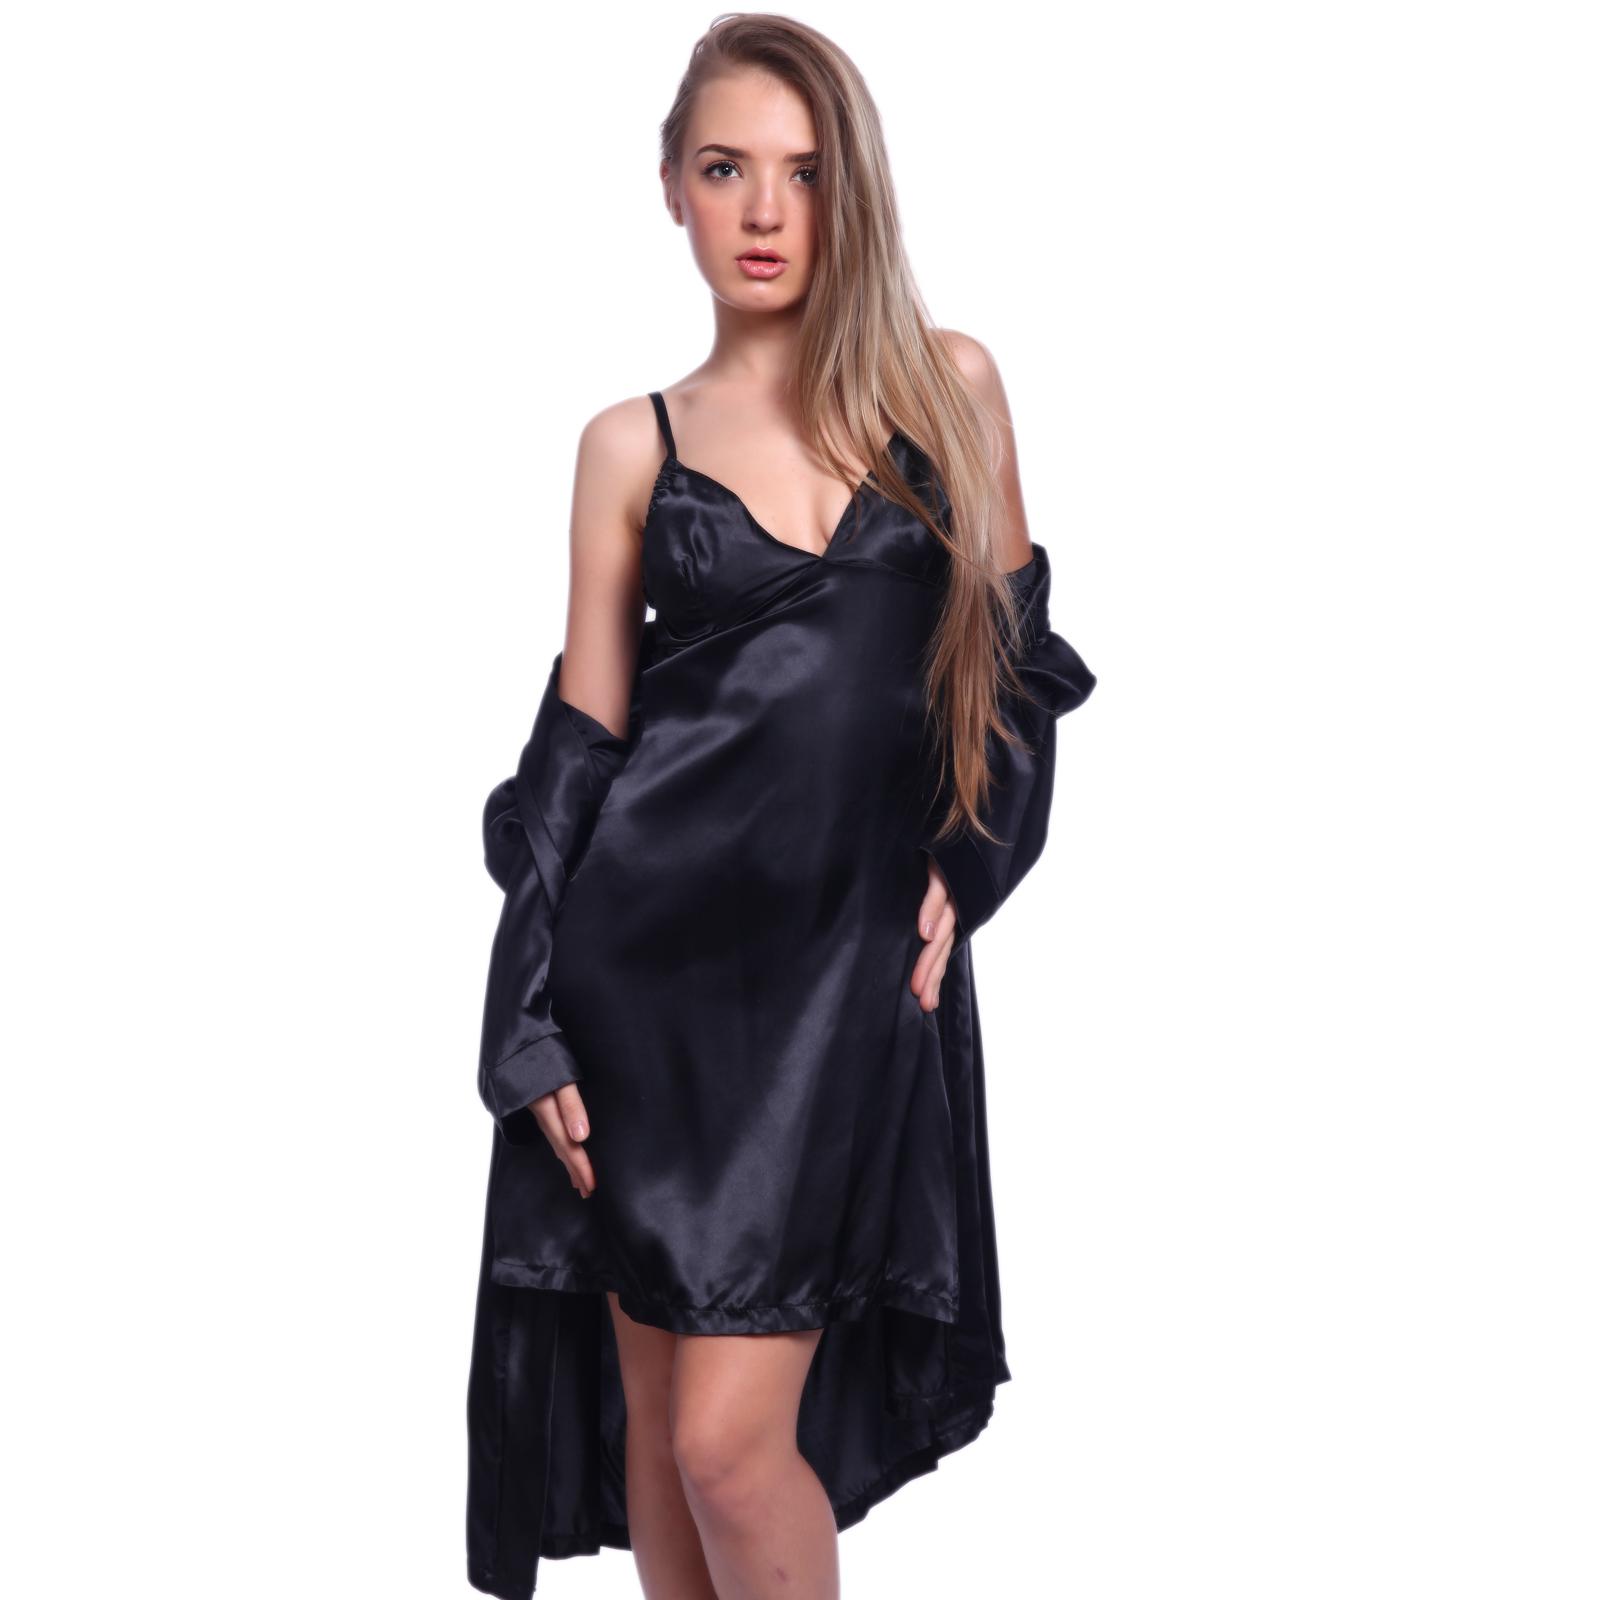 Sexy Satin Slip Lace Back Chemise Sleepwear Lingerie